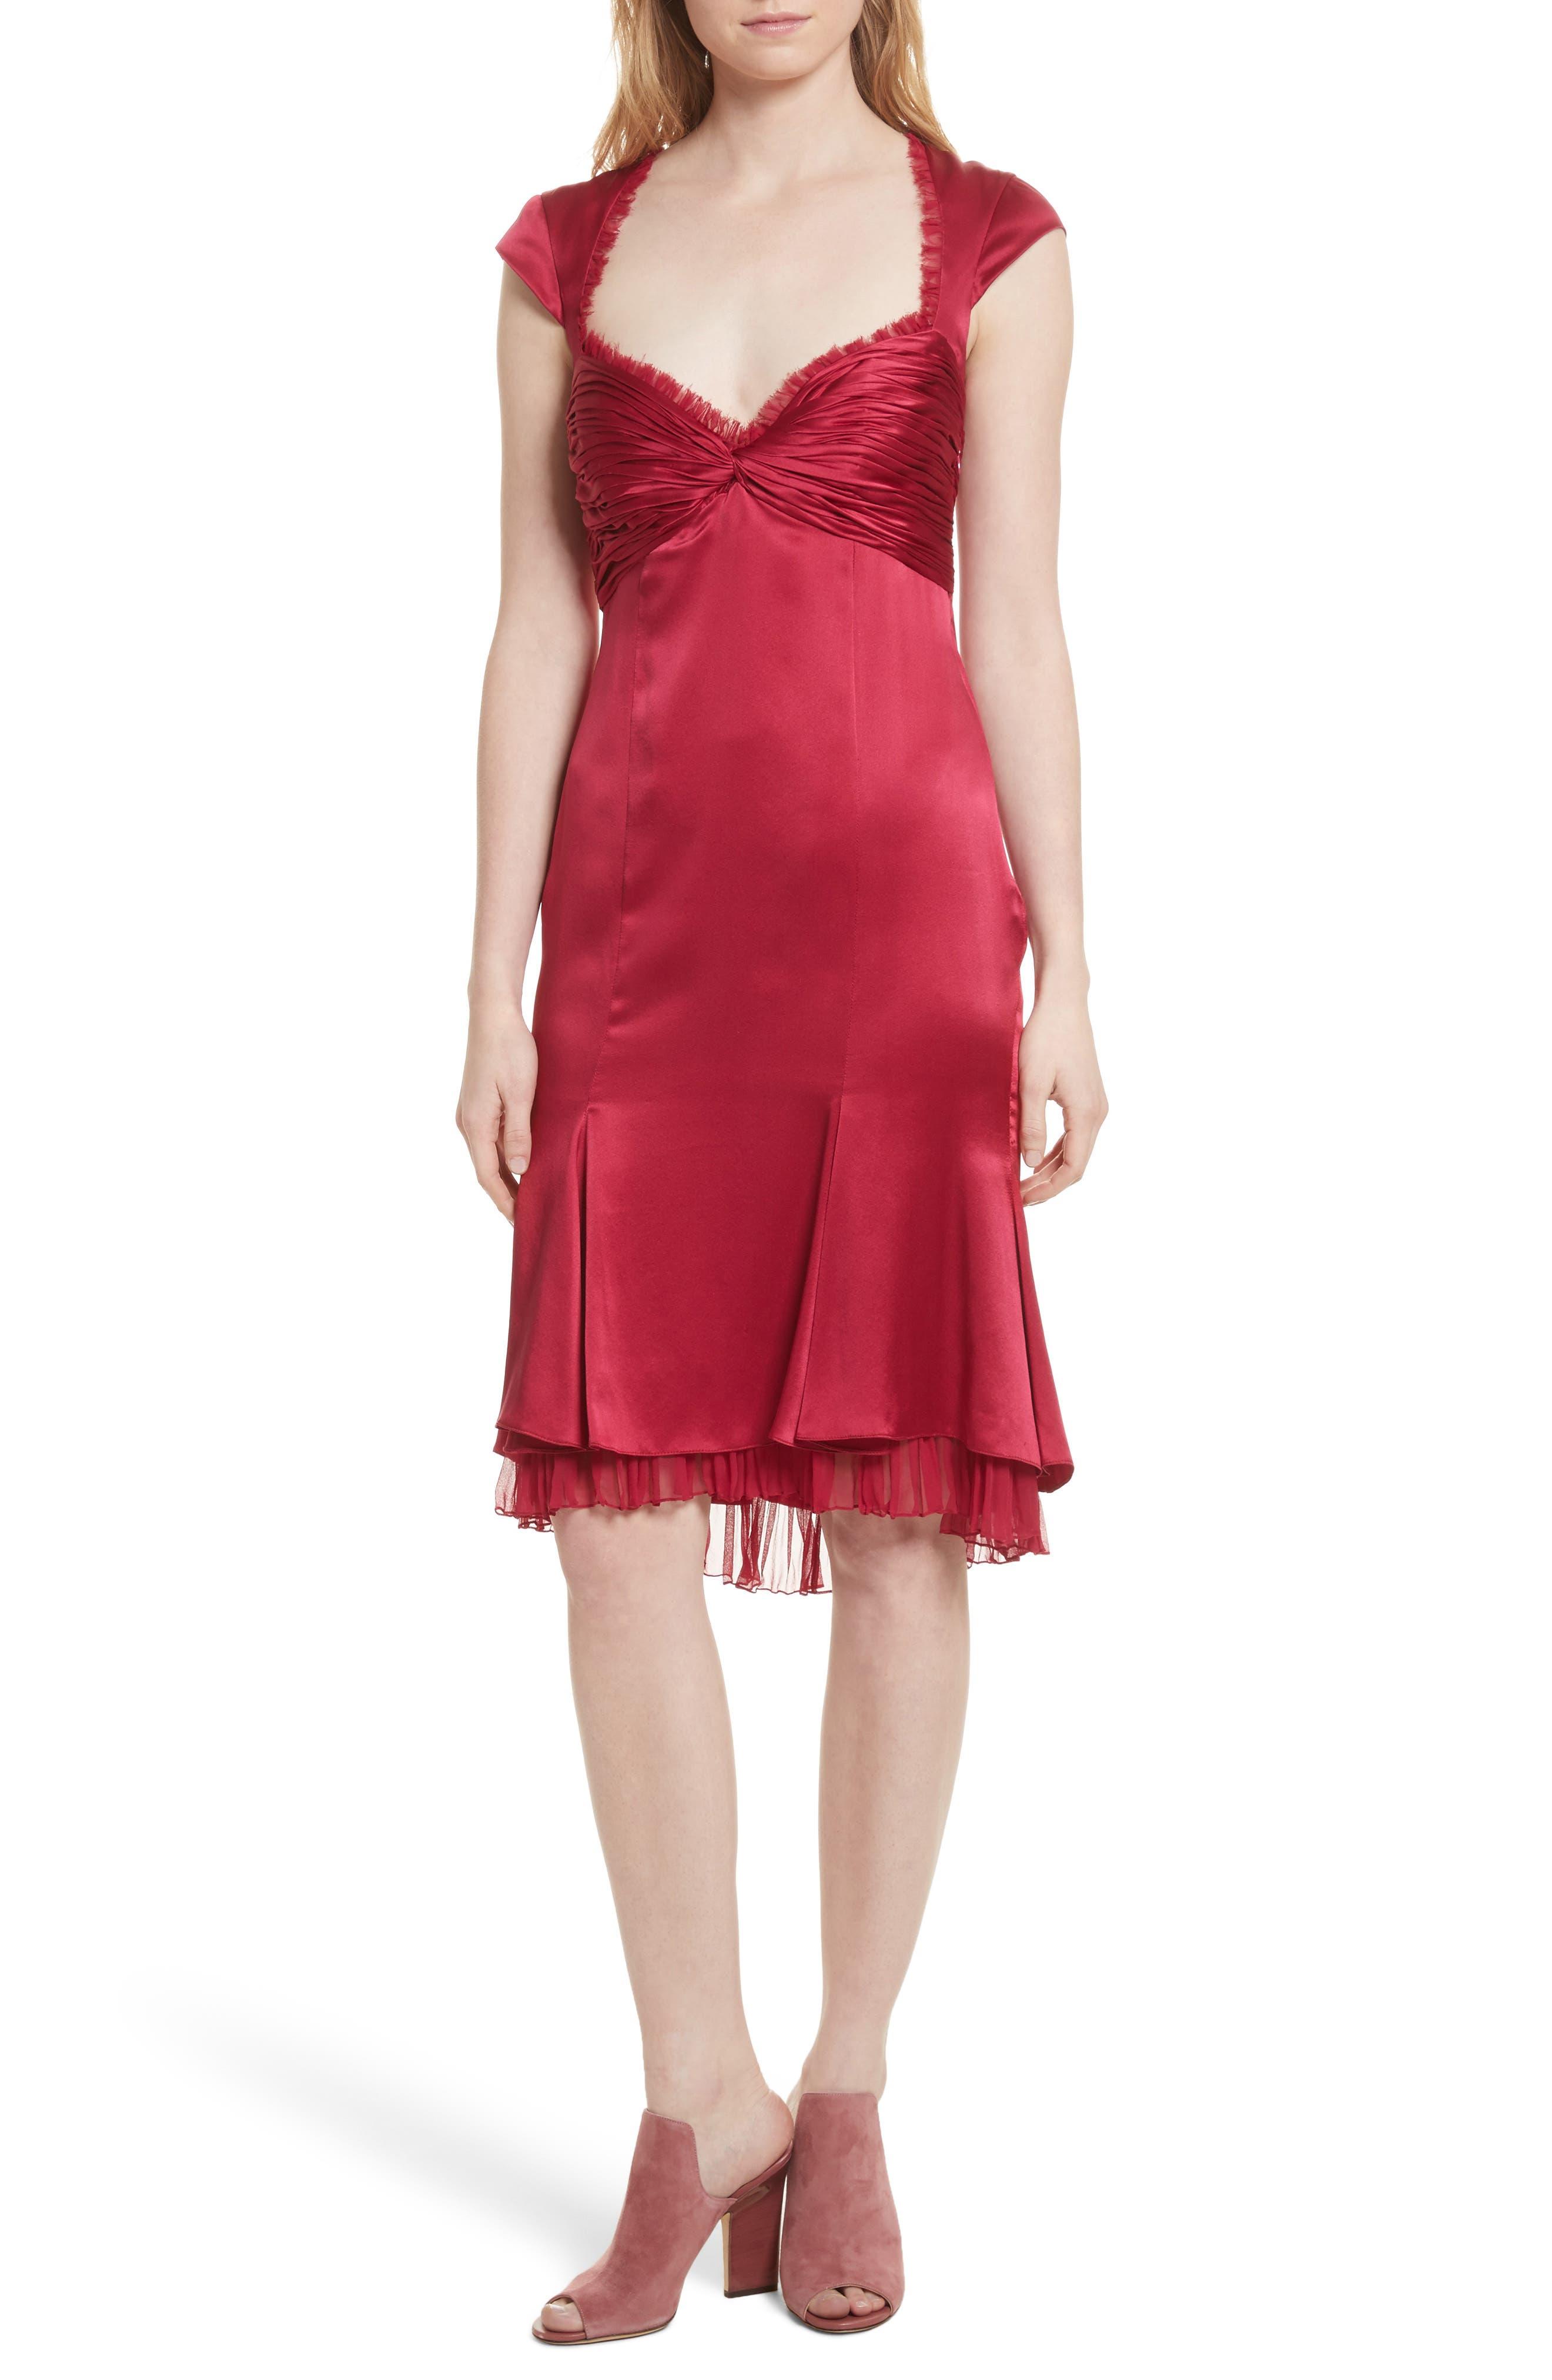 Main Image - Cinq à Sept Marnie Satin Dress